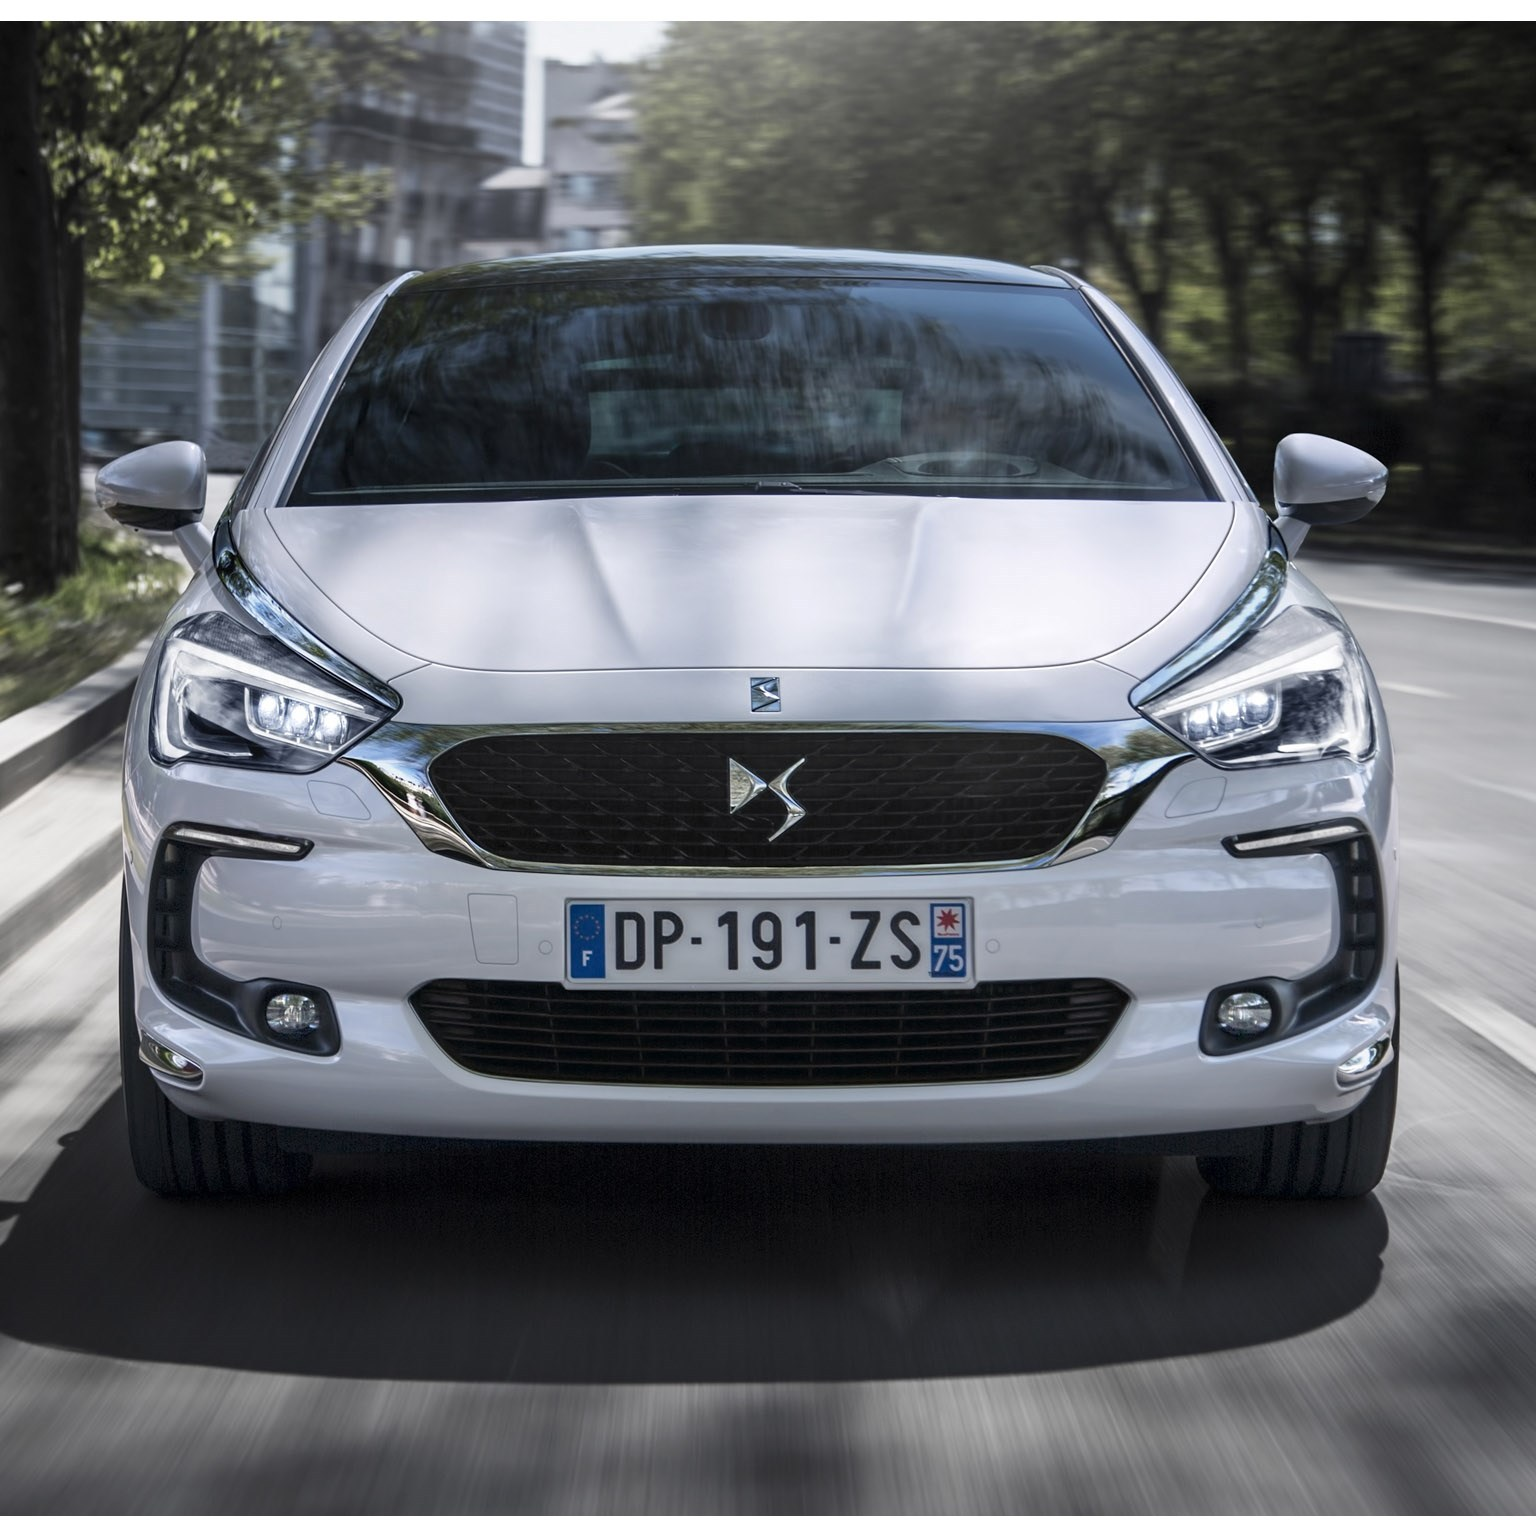 2015 DS5 Hybrid 4x4